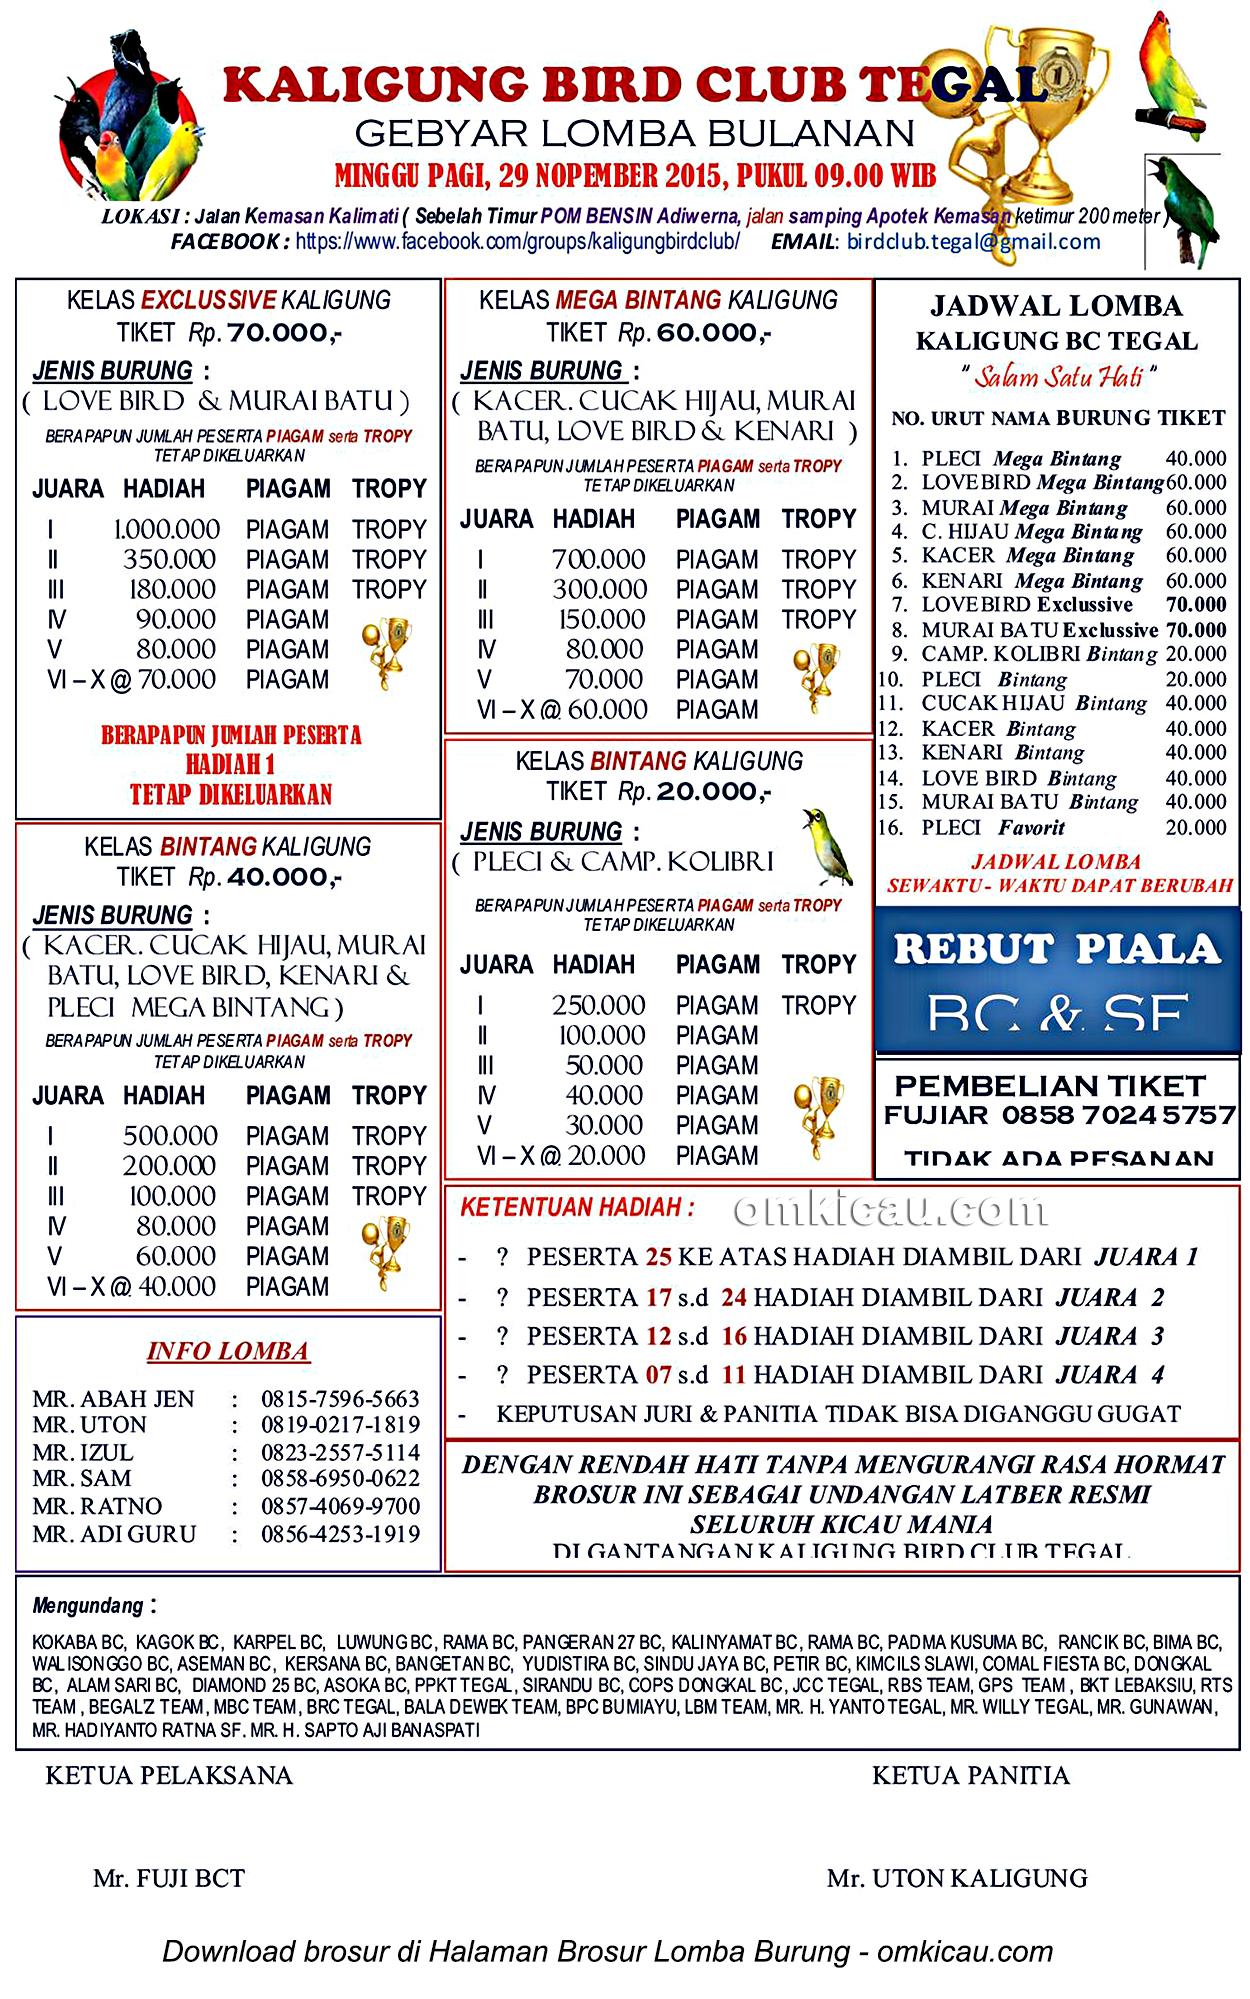 Brosur Lomba Burung Berkicau Kaligung BC, Tegal, 29 November 2015